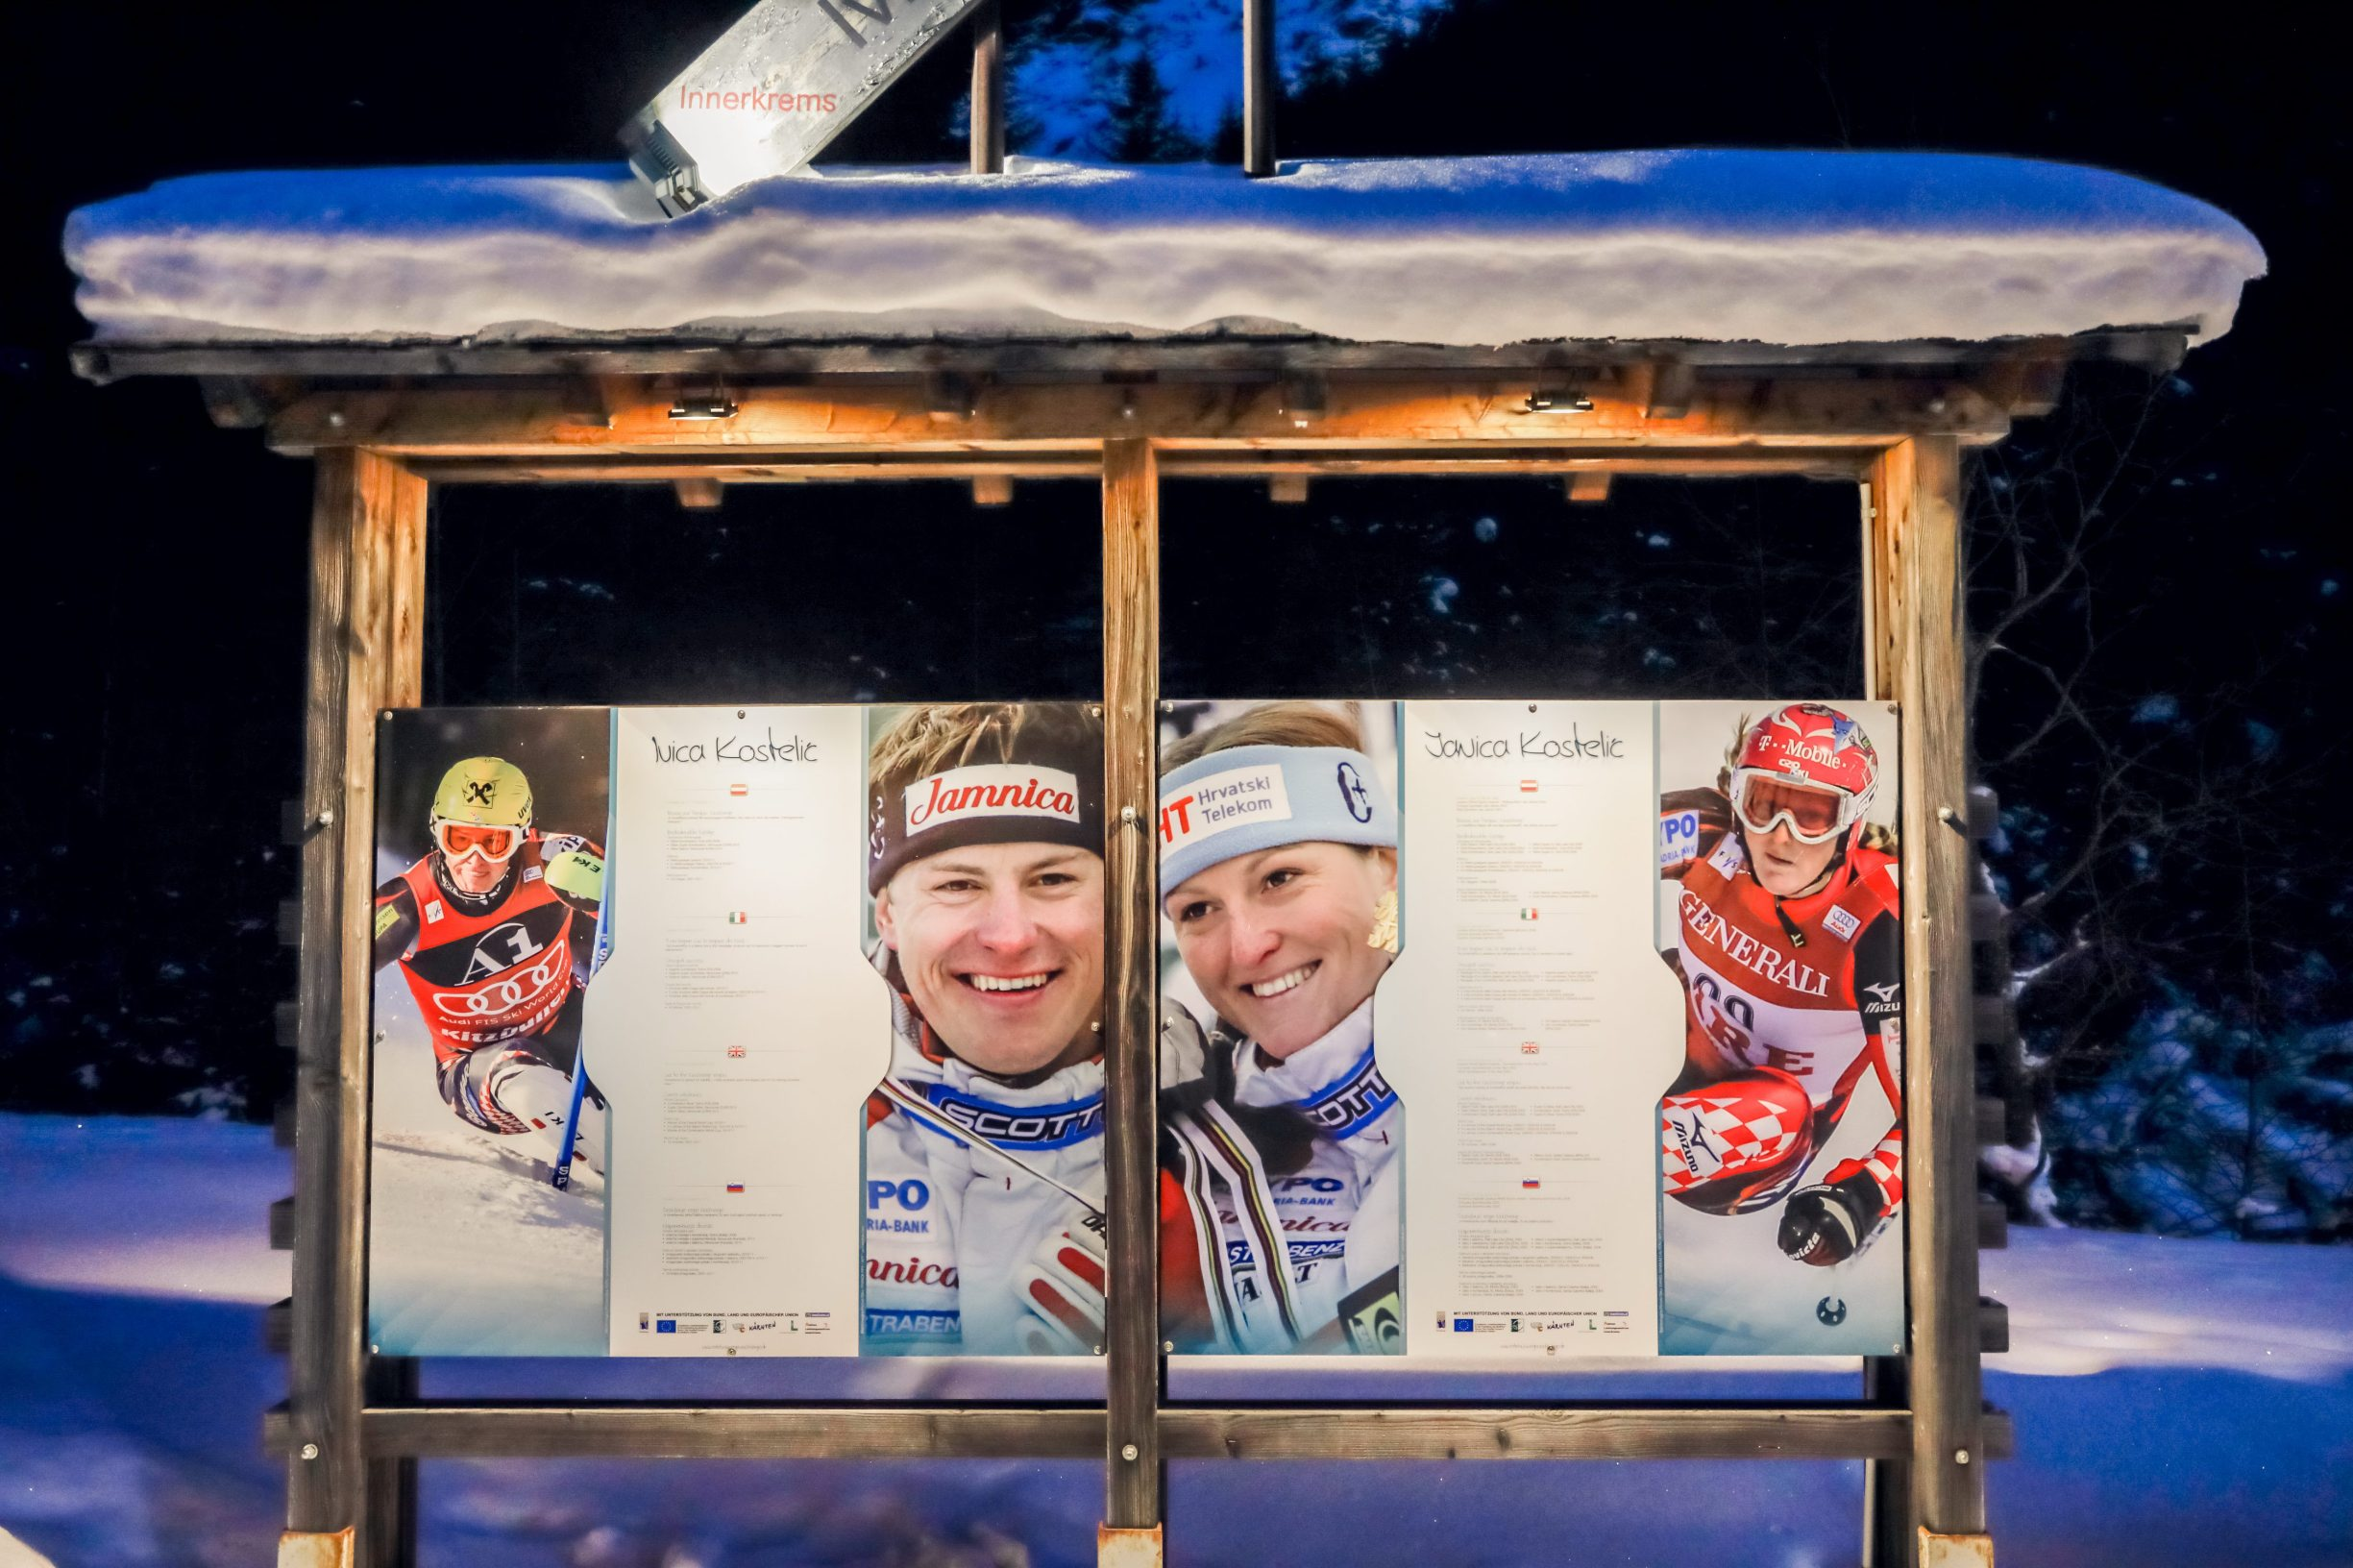 Innerkrems, Austrija, 130120 SKI Patrola Jutarnjeg Lista, skijaliste Innerkrems. Foto: Danijel Soldo / CROPIX